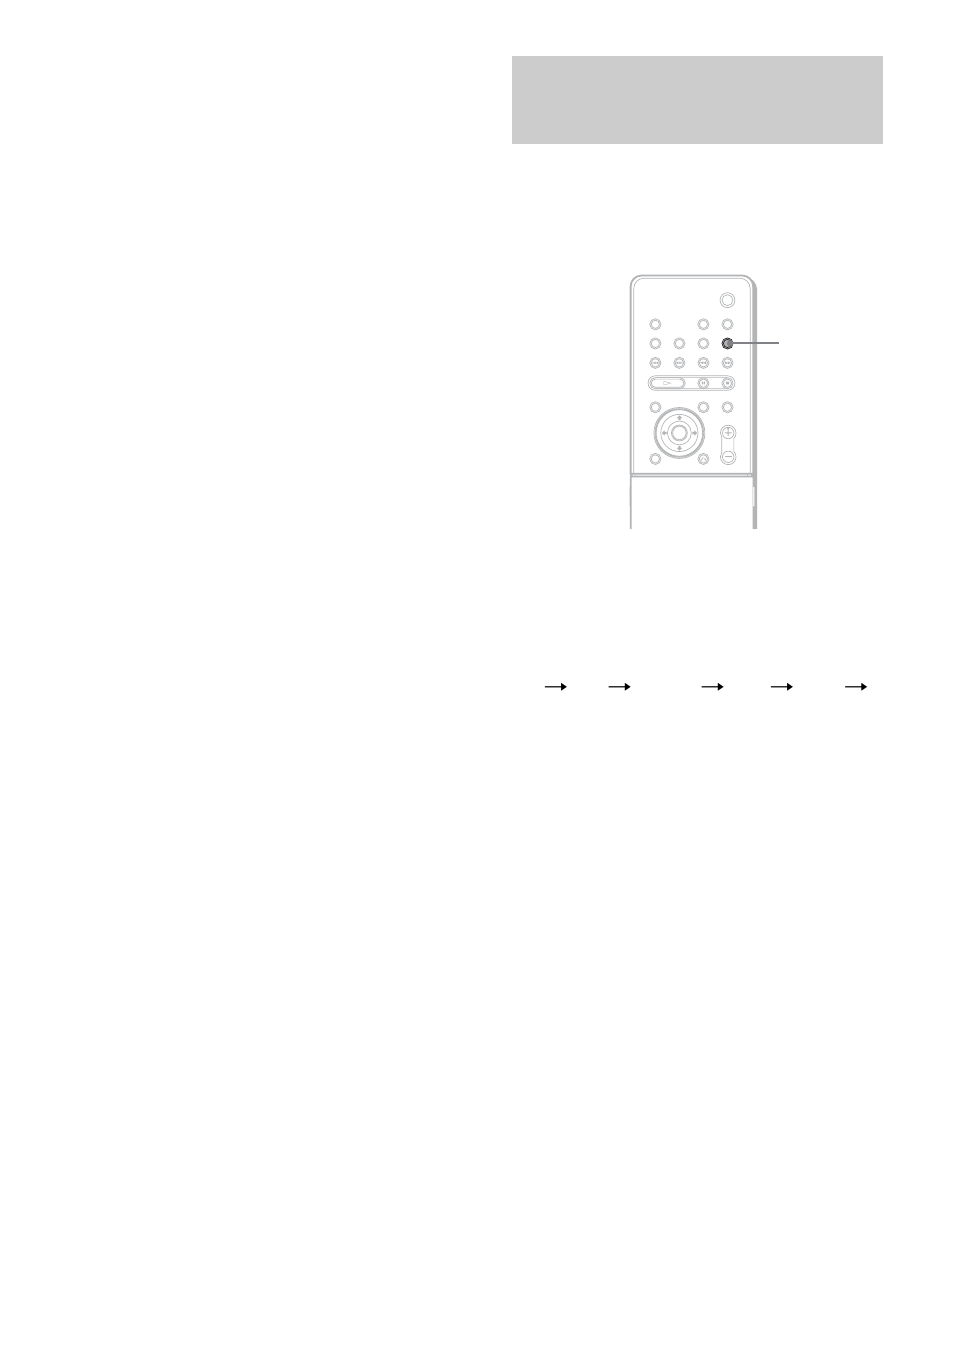 using the video or other units sony dav fr1 user manual page 70 rh manualsdir com sony dav-fr1 remote Sony Theater System DAV Is10